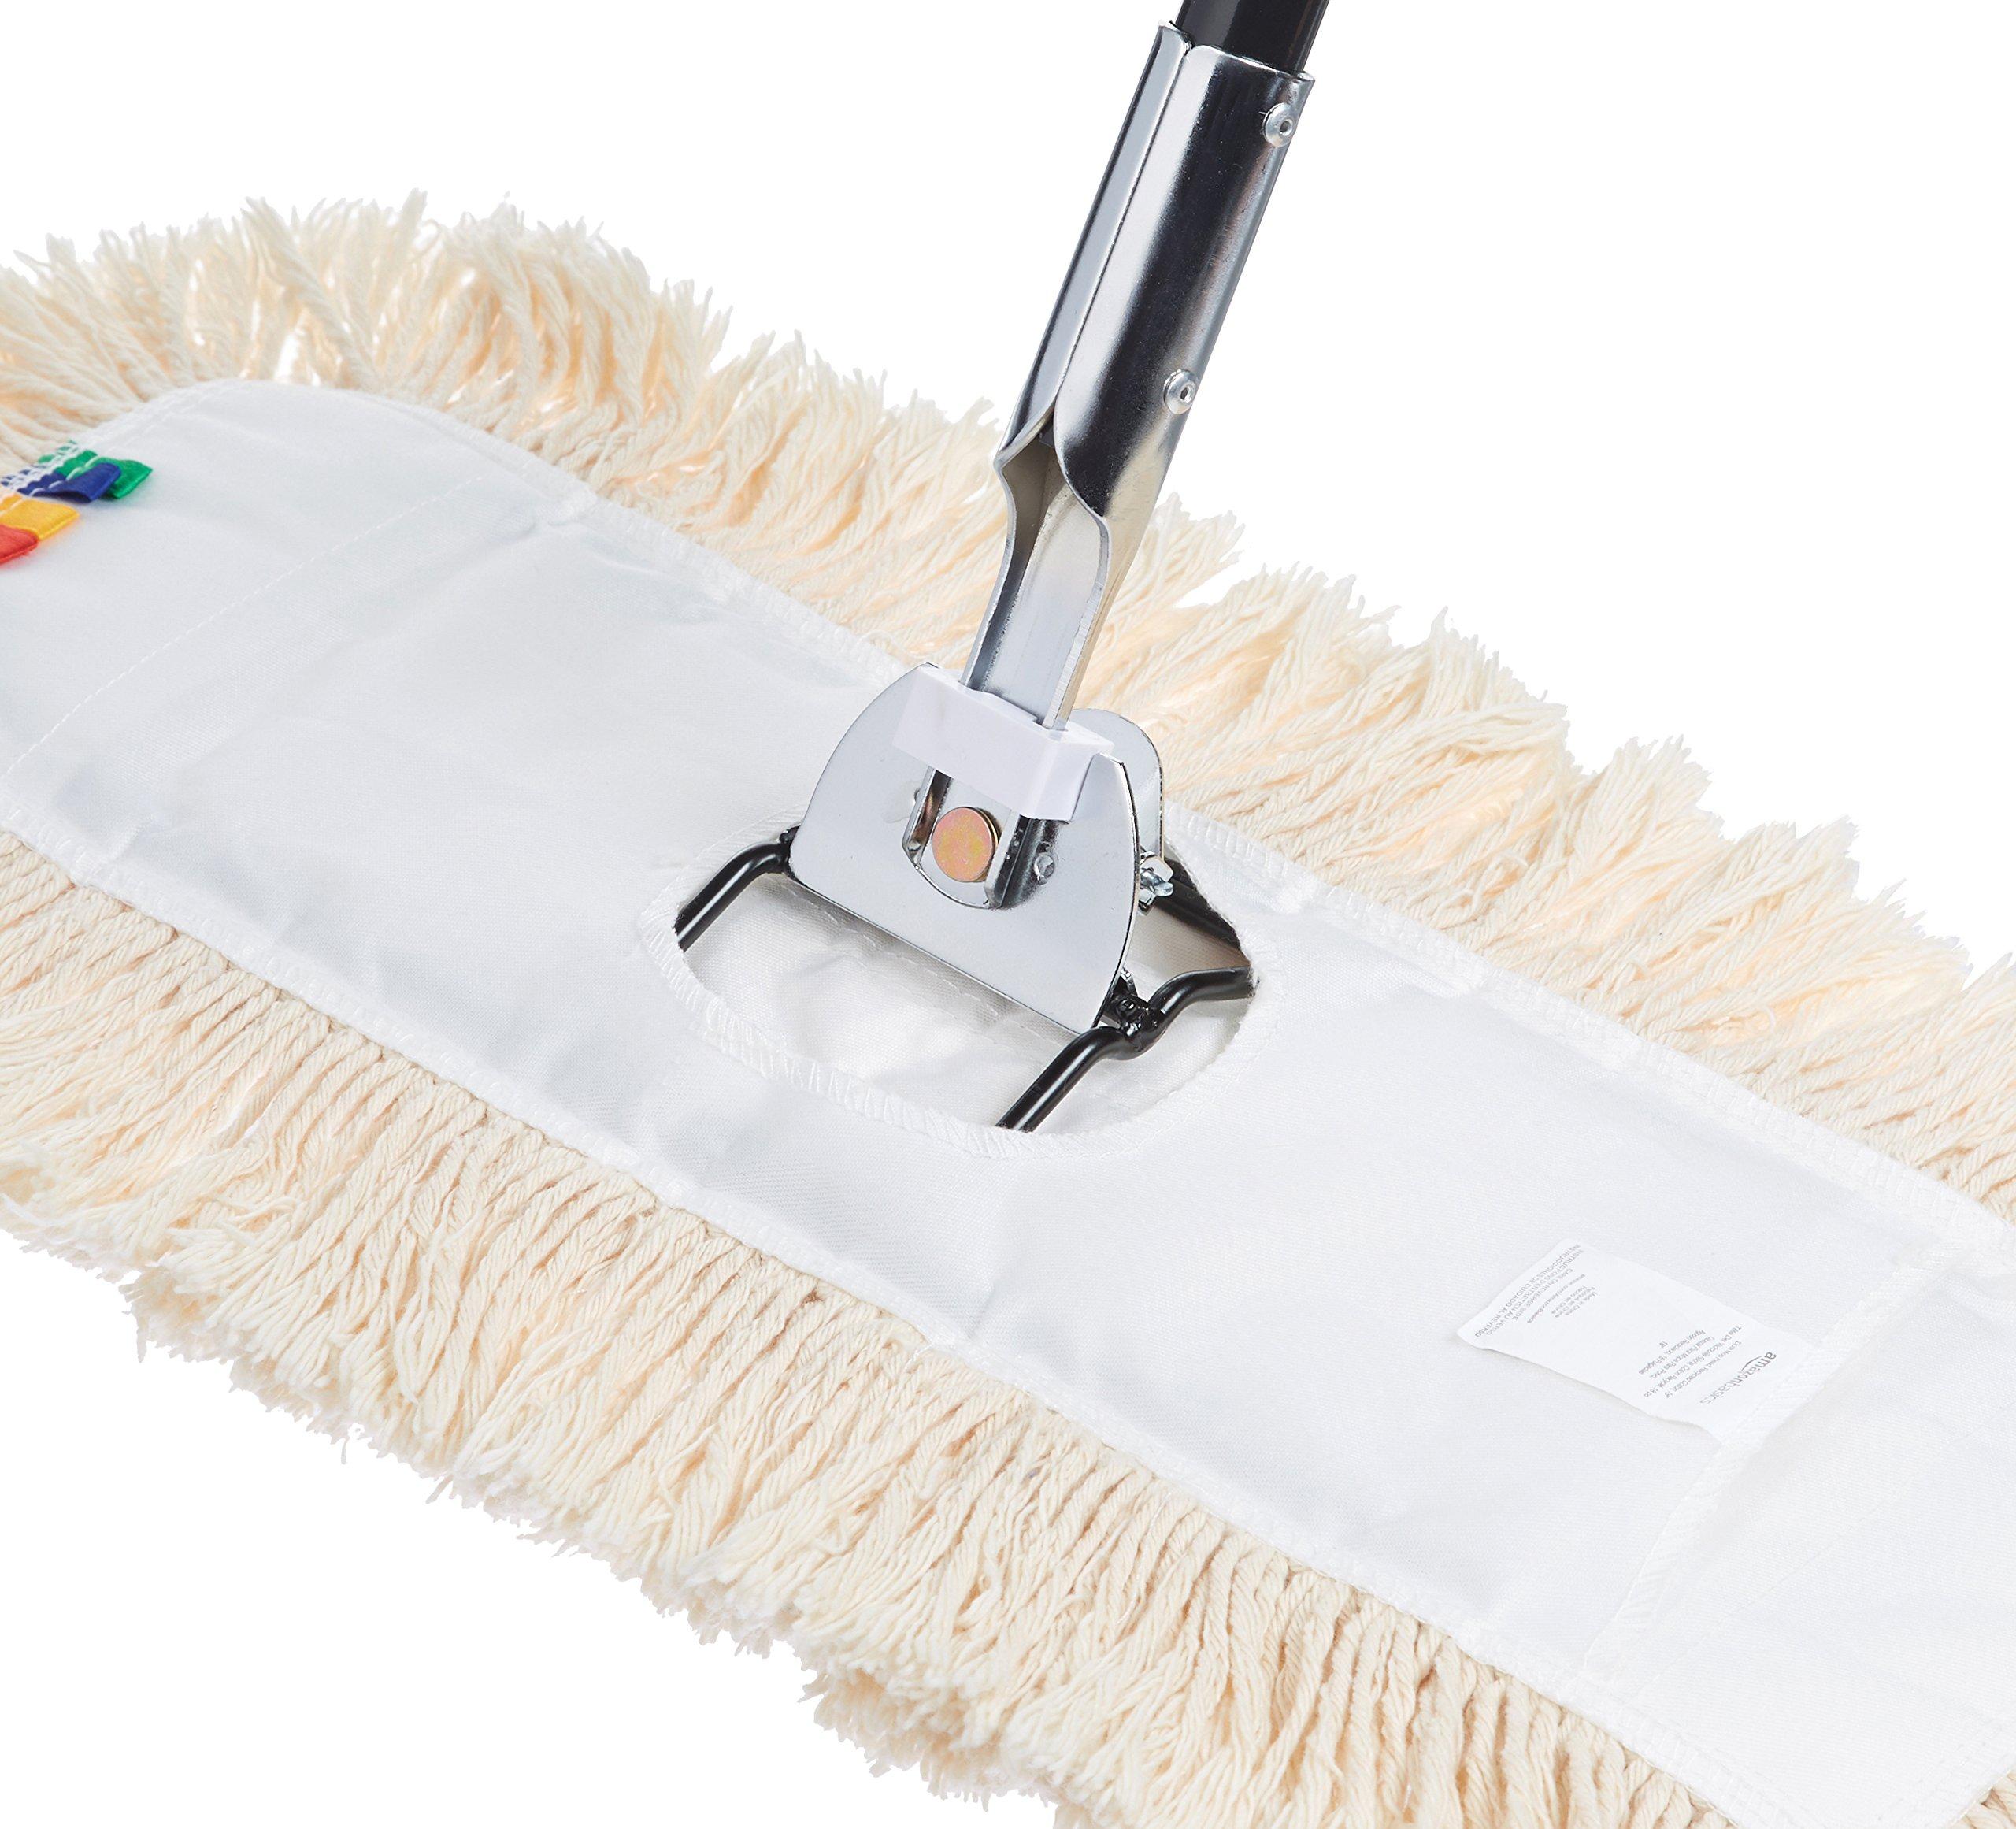 AmazonBasics 60-Inch Steel Dust Mop Handle - 6-Pack by AmazonBasics (Image #4)